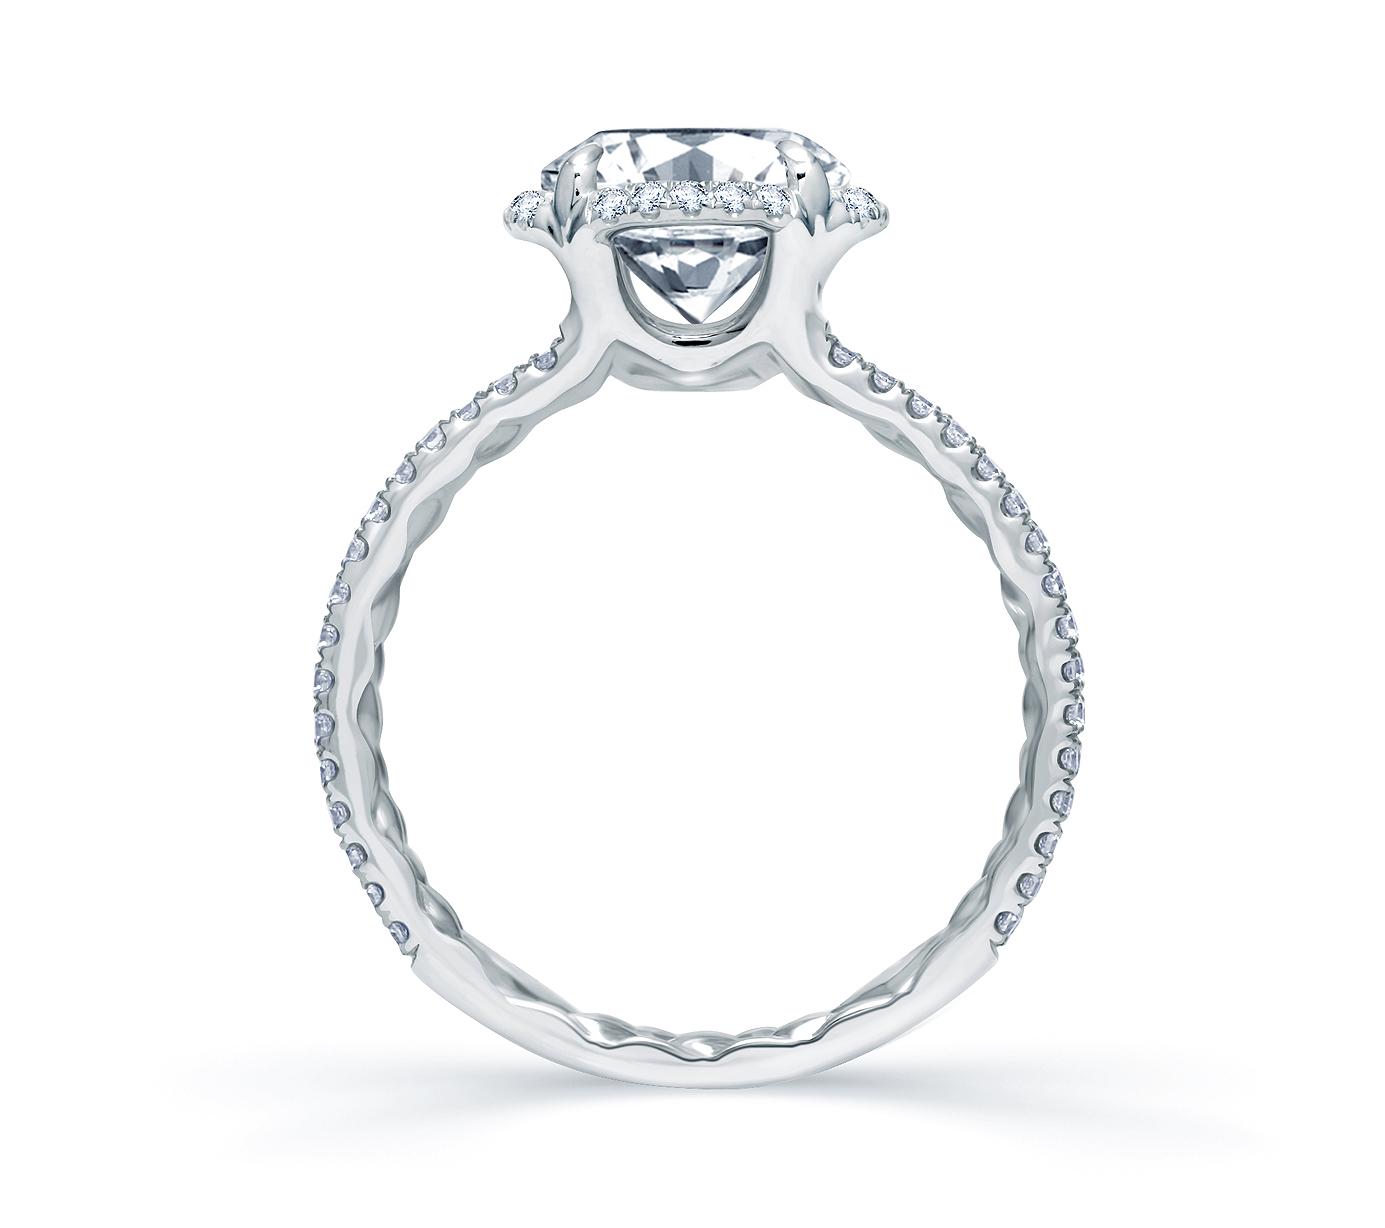 A.Jaffe Rings | Van Gundys | Camarillo Jewelers